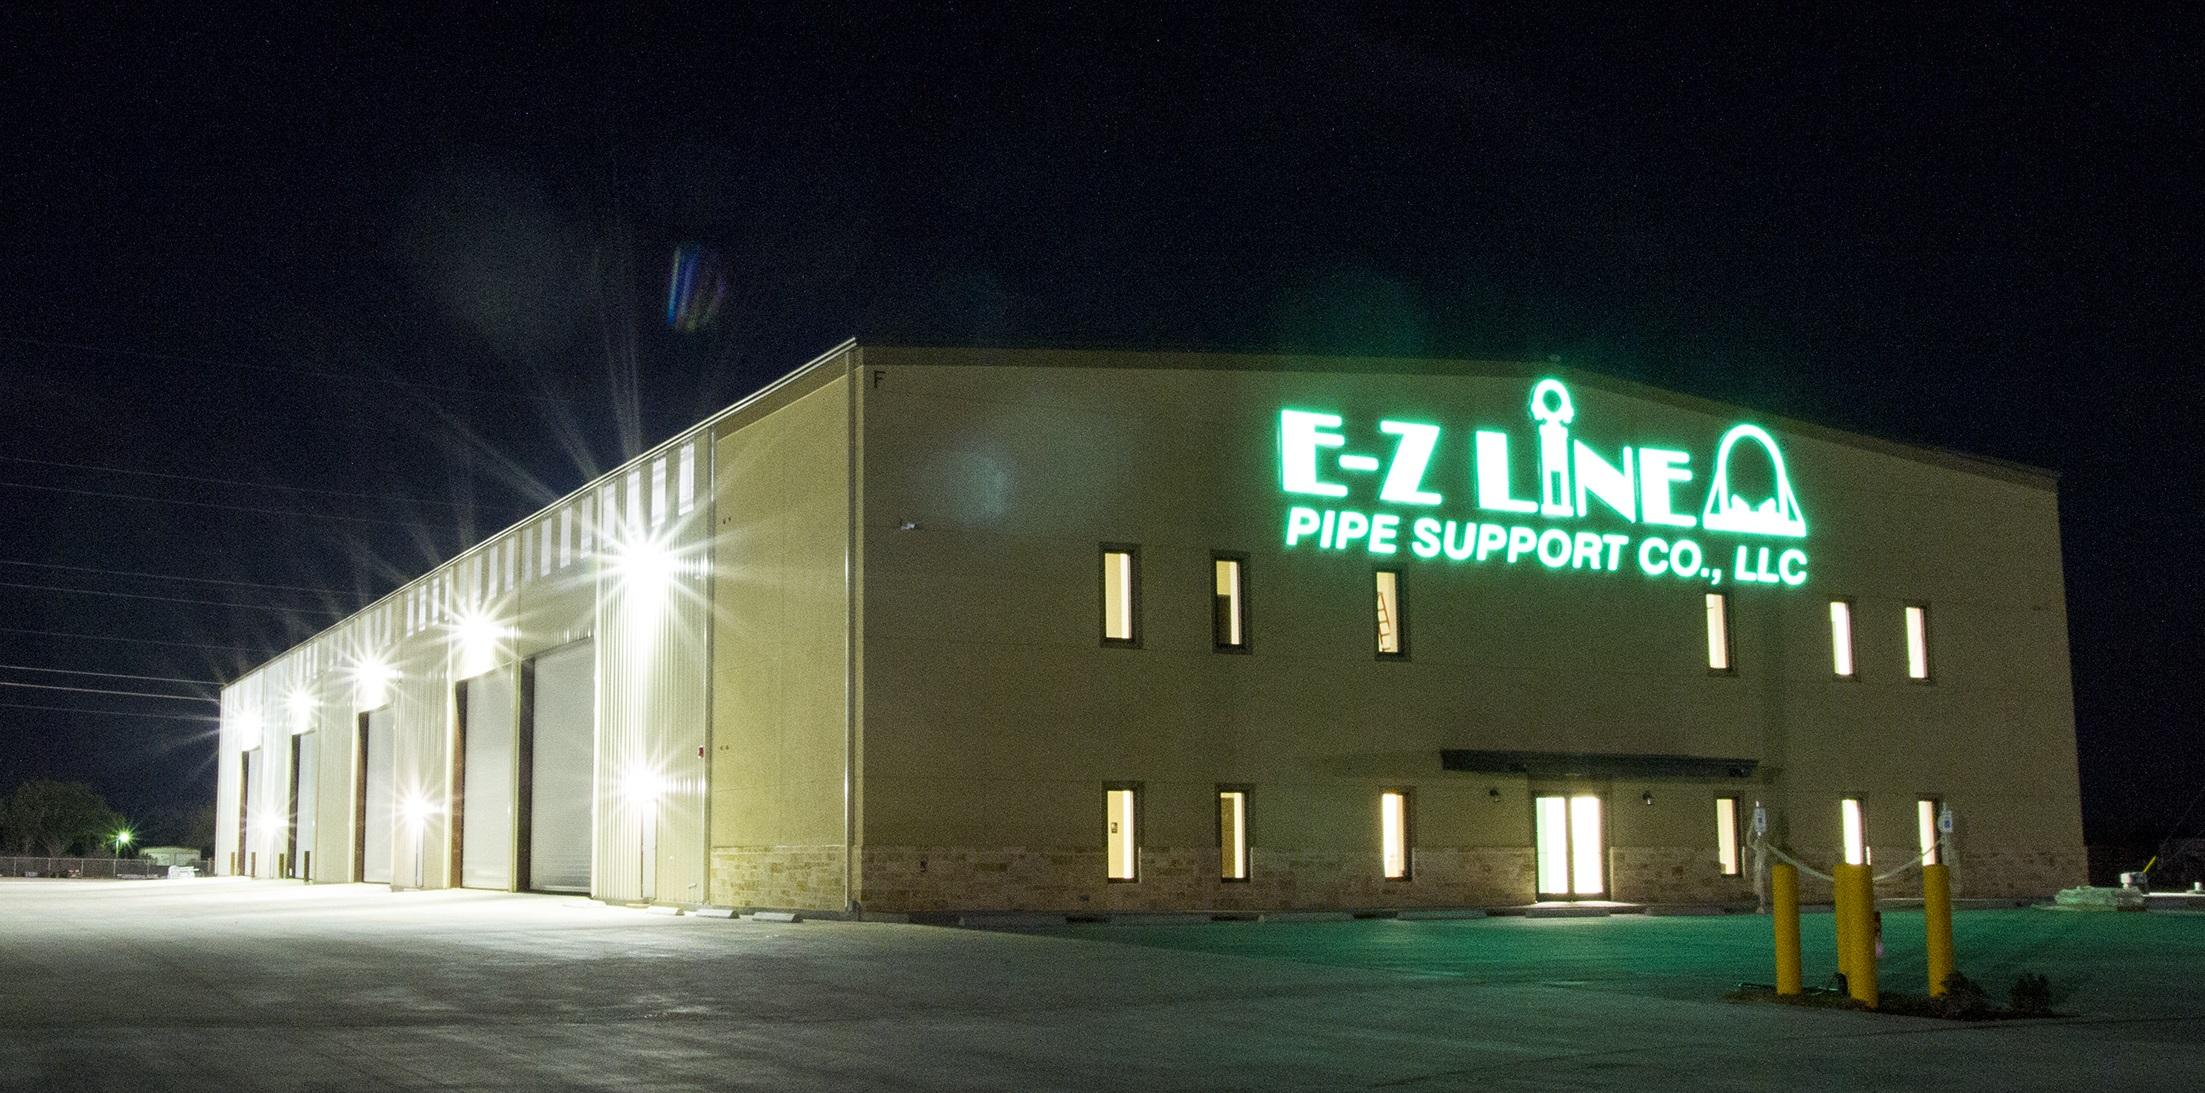 EZ line